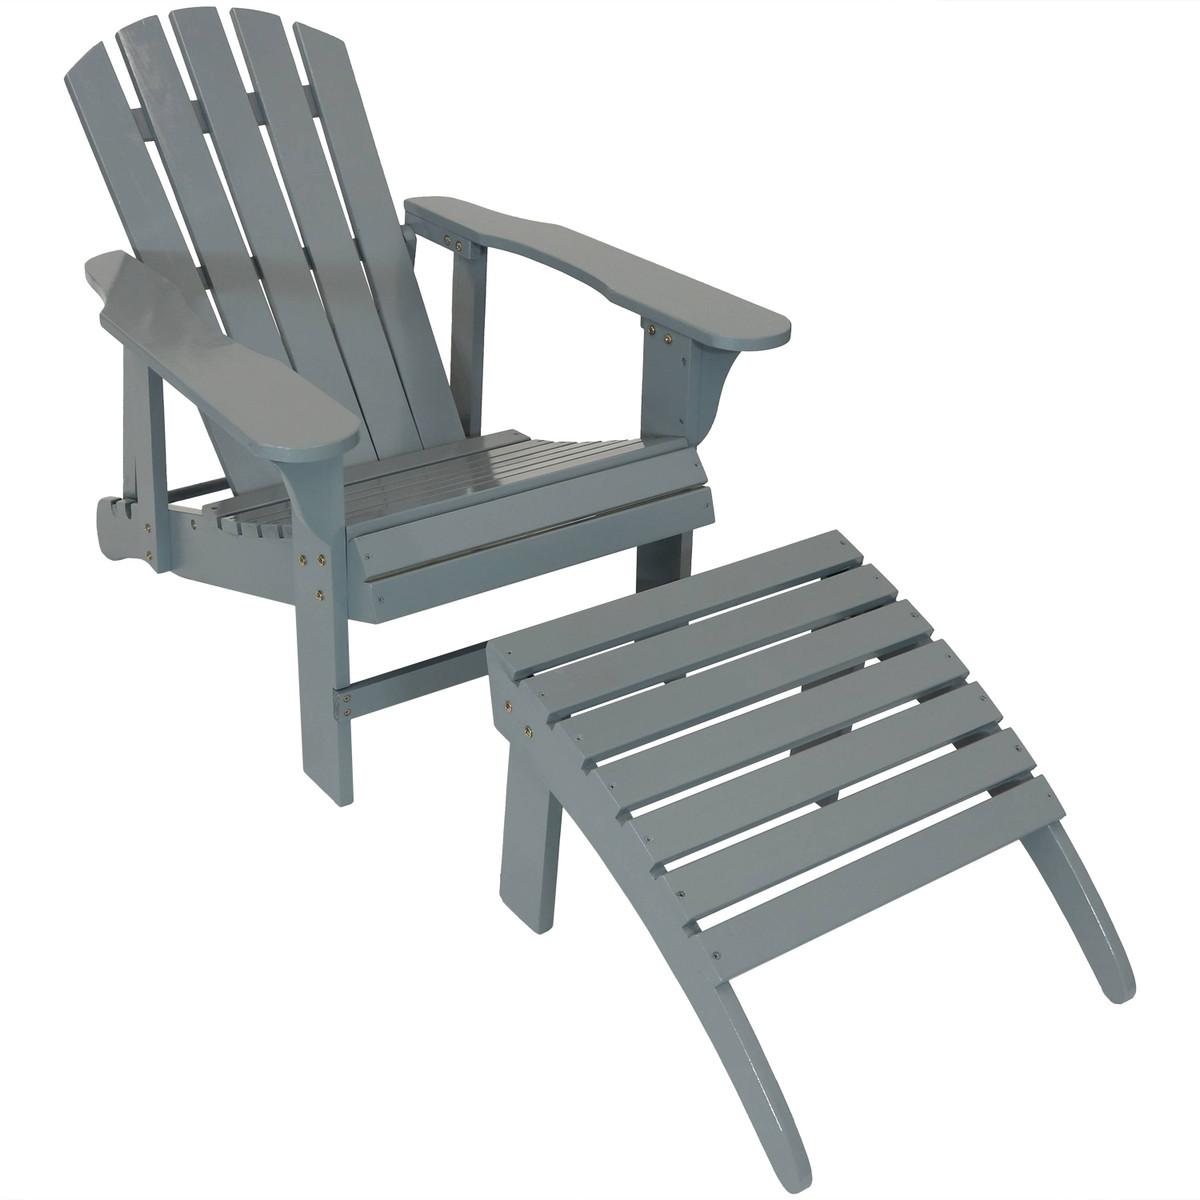 Outstanding Sunnydaze Wooden Outdoor Adirondack Chair With Adjustable Machost Co Dining Chair Design Ideas Machostcouk